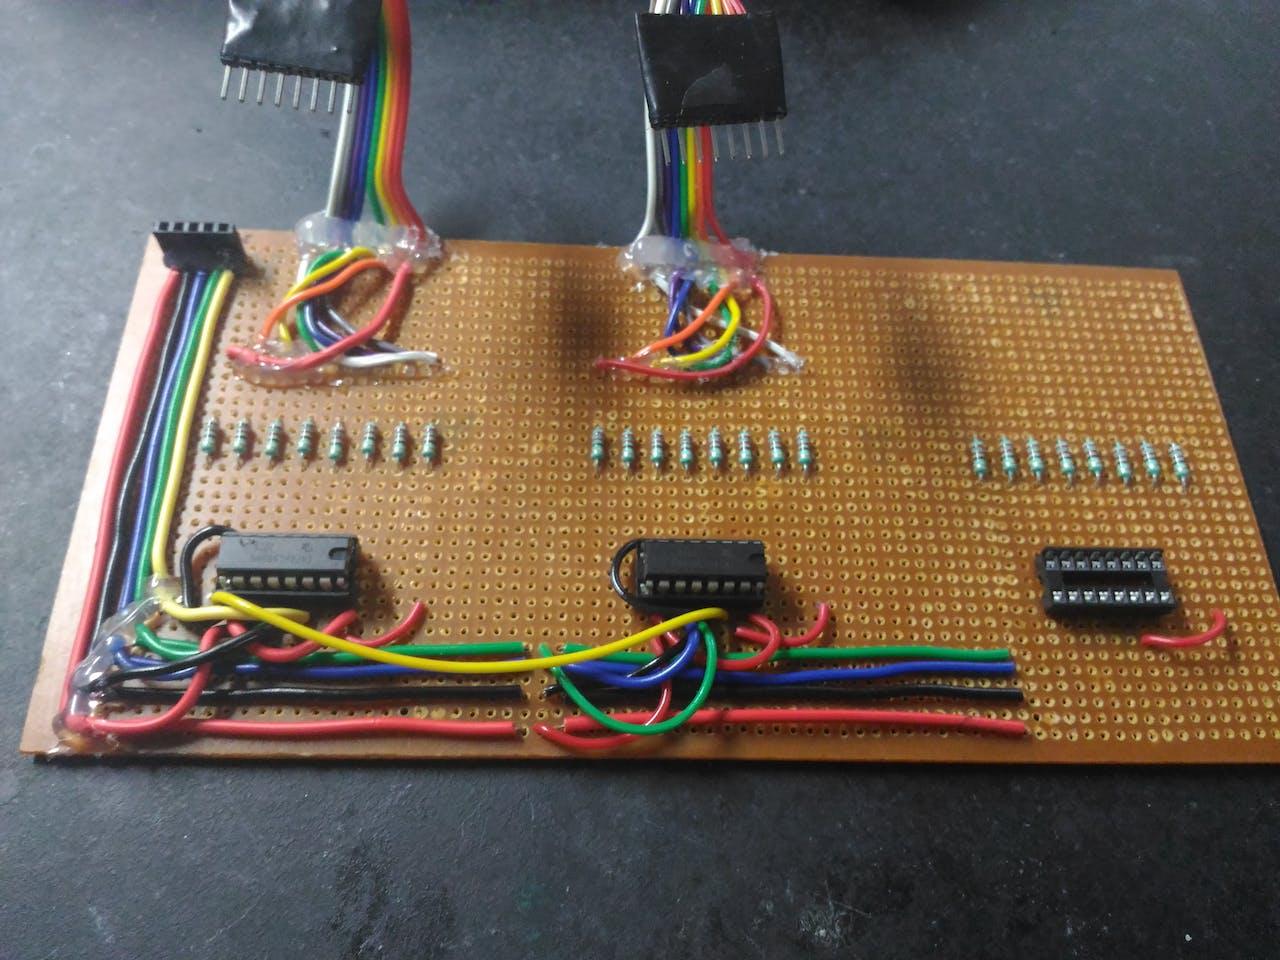 48 X 8 Scrolling Led Matrix Using Arduino Digital Meter Also Circuit Diagram On Voltmeter